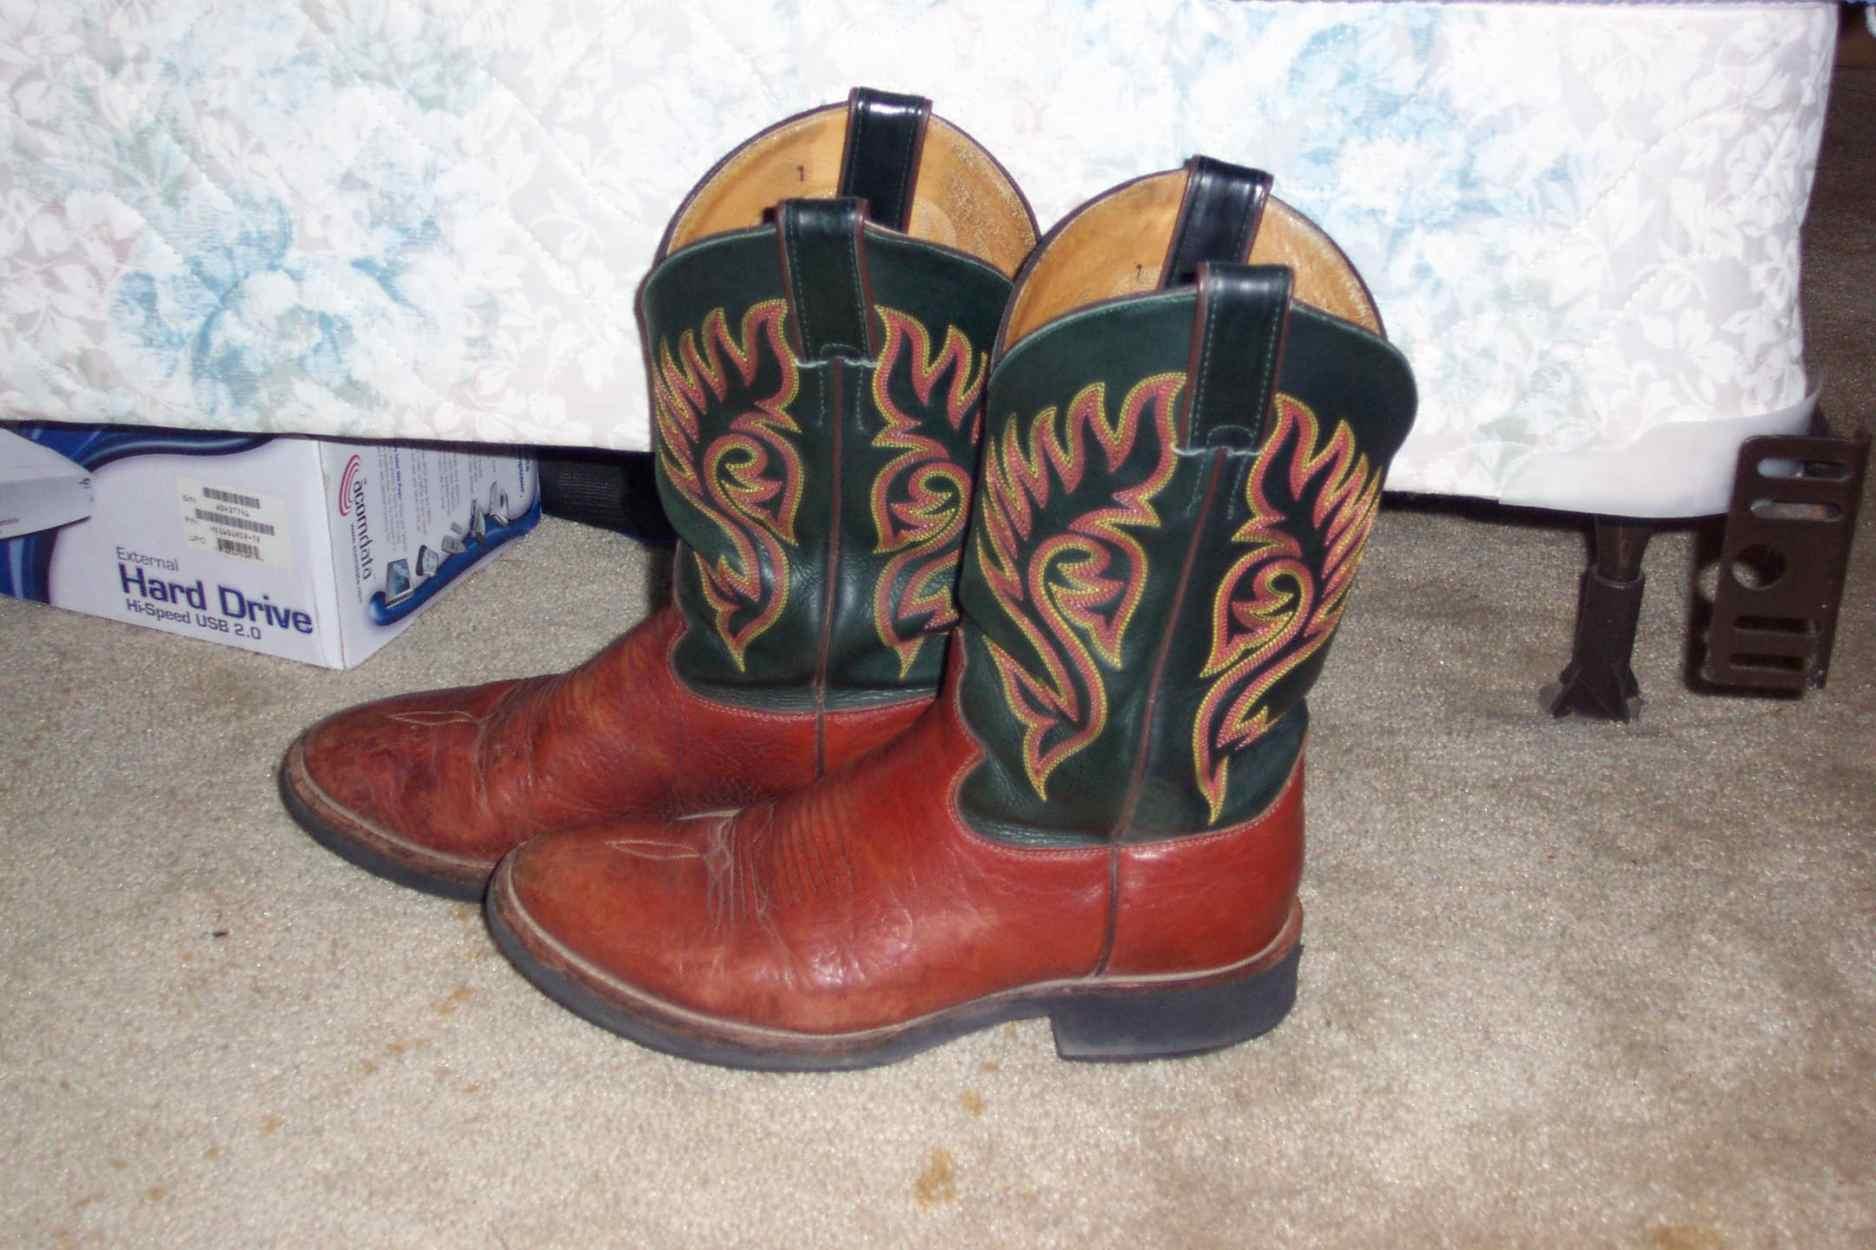 My CowboyBoots